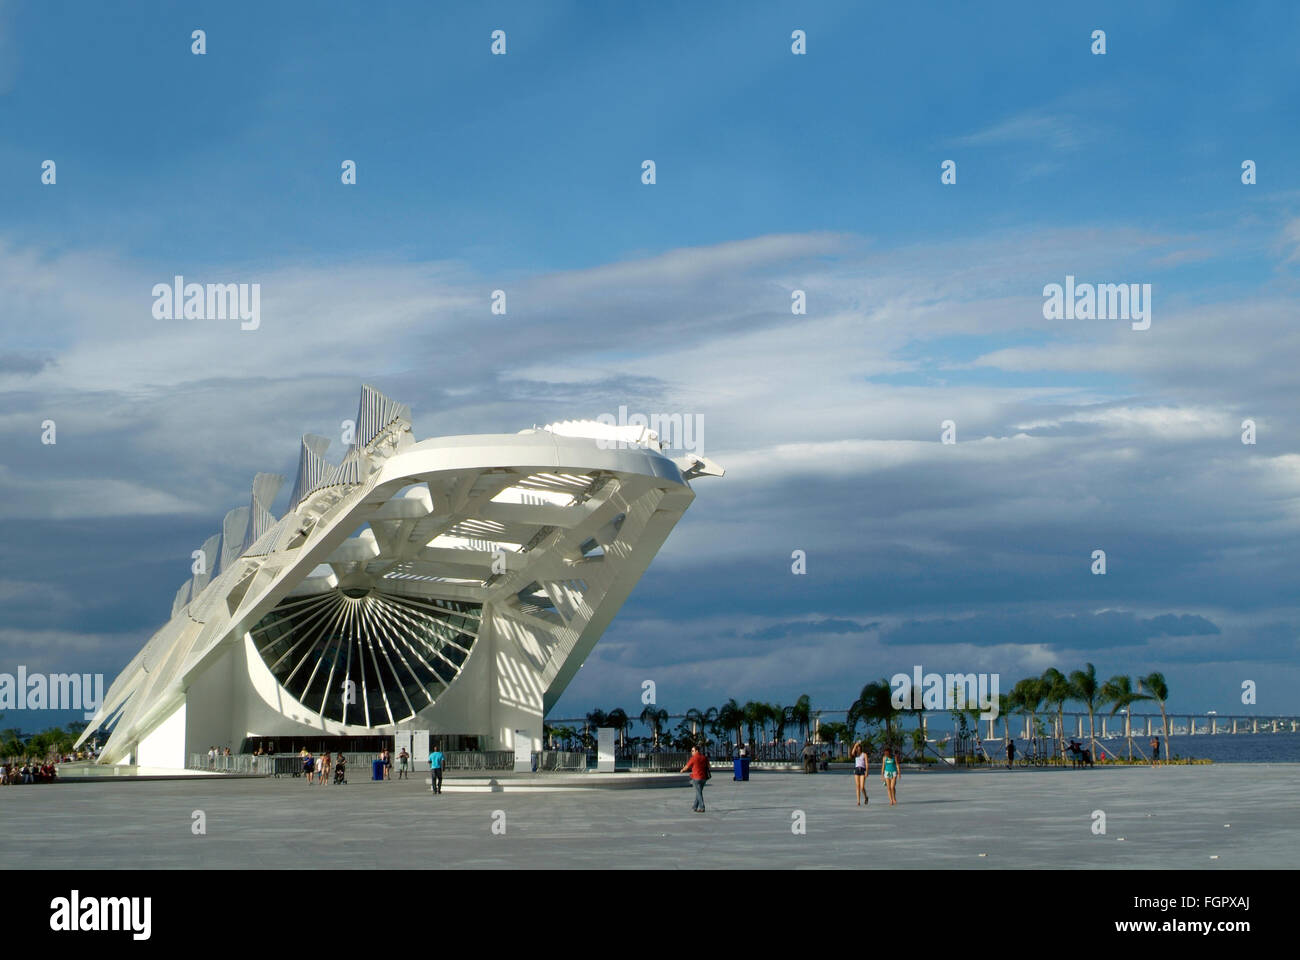 Rio de Janeiro, Brazil - February 18, 2016, Museum of Tomorrow (Tomorrow Museum), designed by Spanish architect - Stock Image